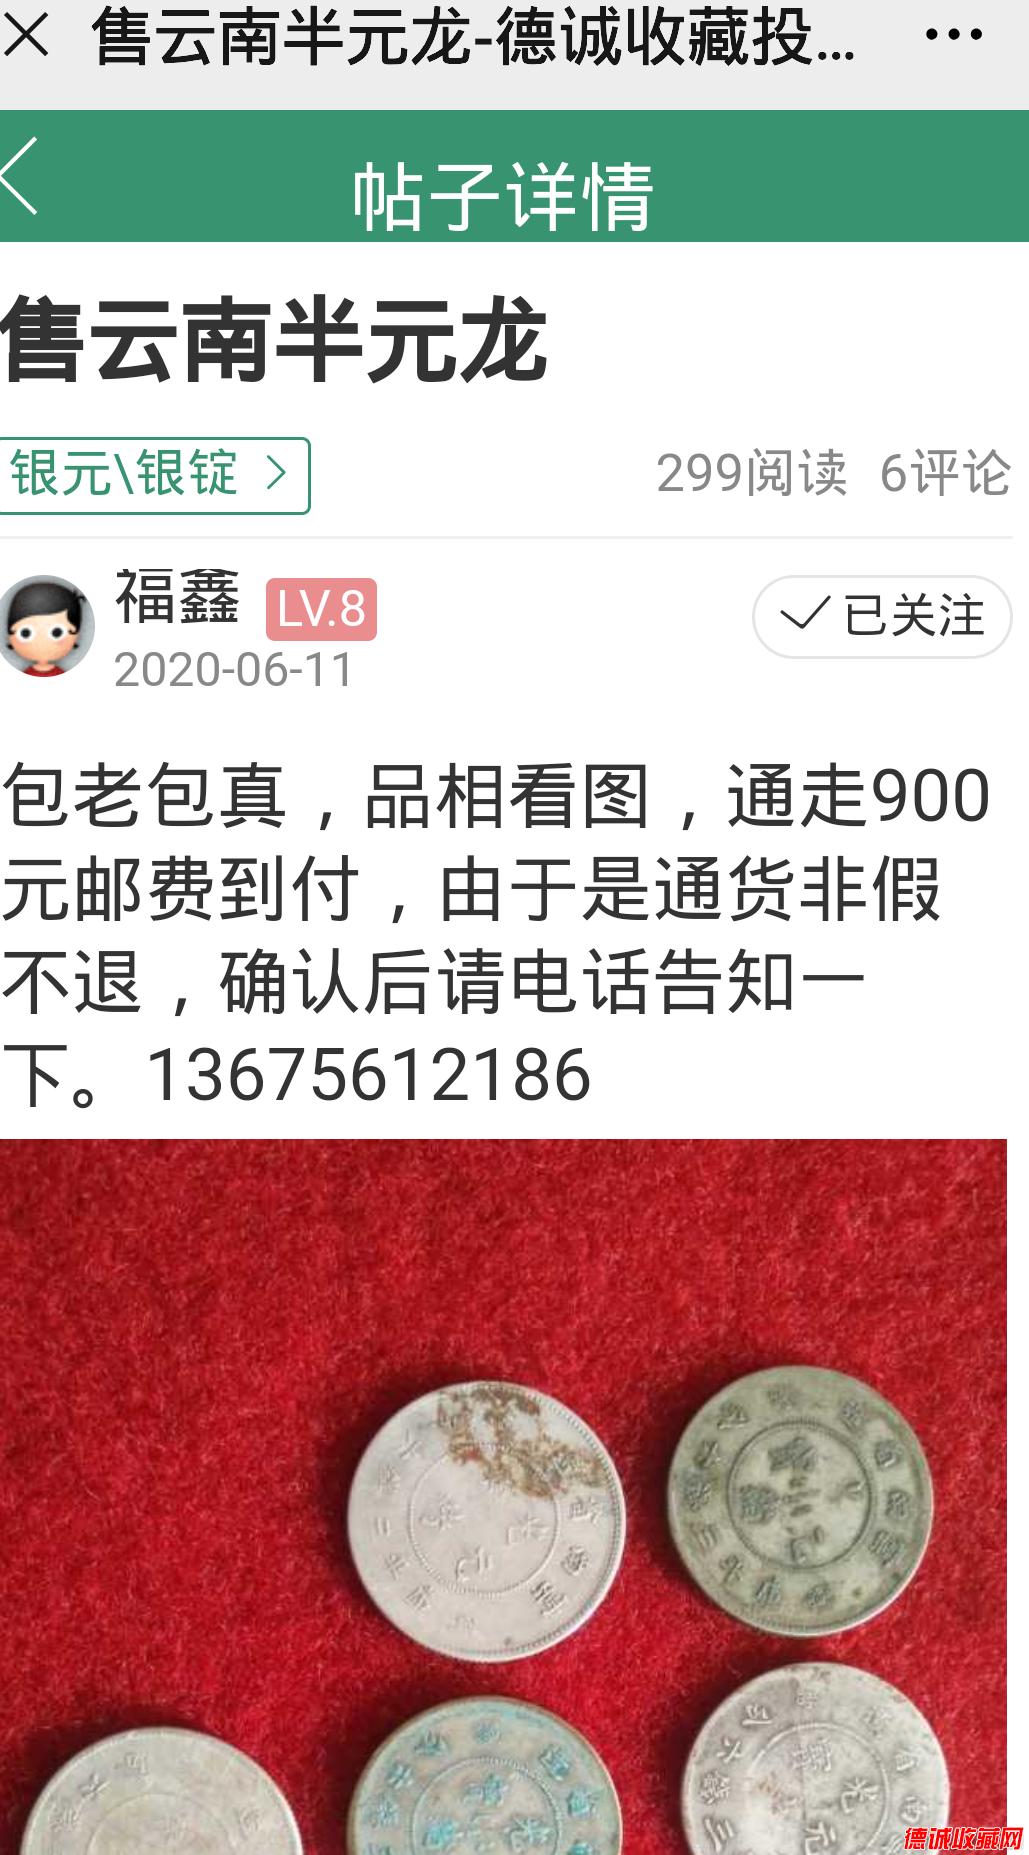 Screenshot_2020_0621_151715.png